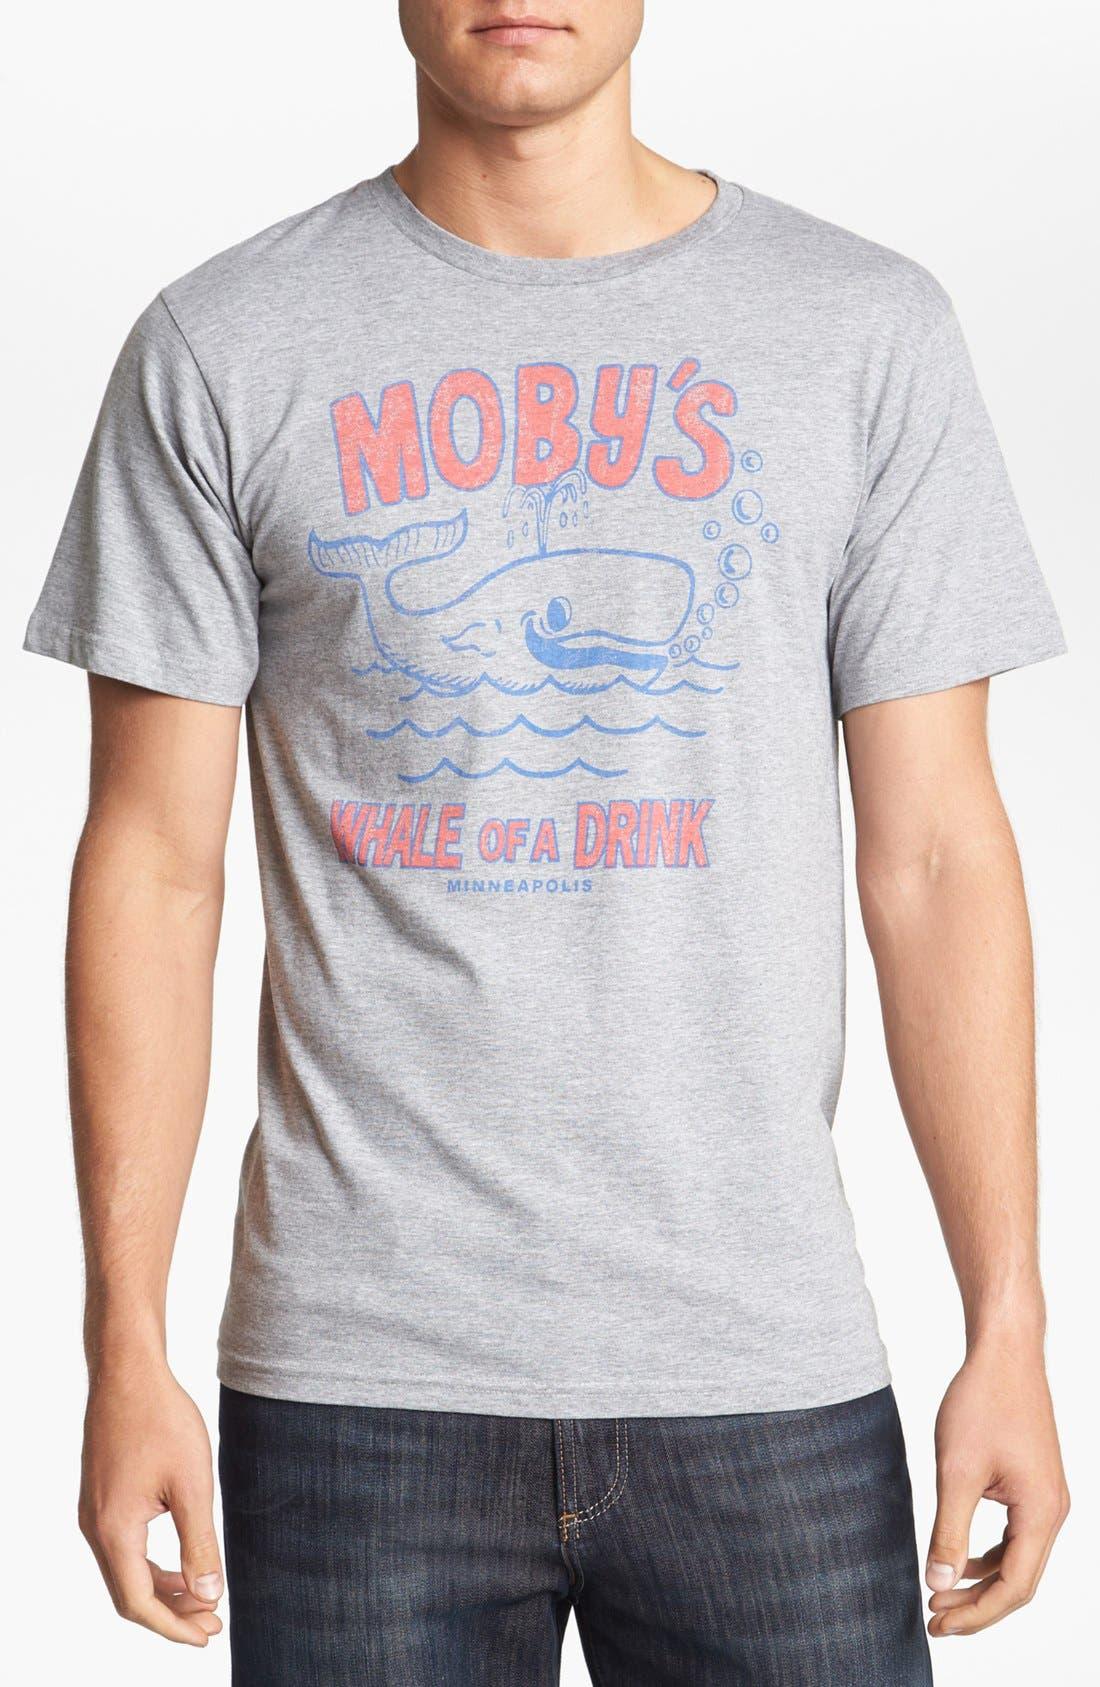 Alternate Image 1 Selected - Horses Cut Shop 'Moby Dick's' T-Shirt